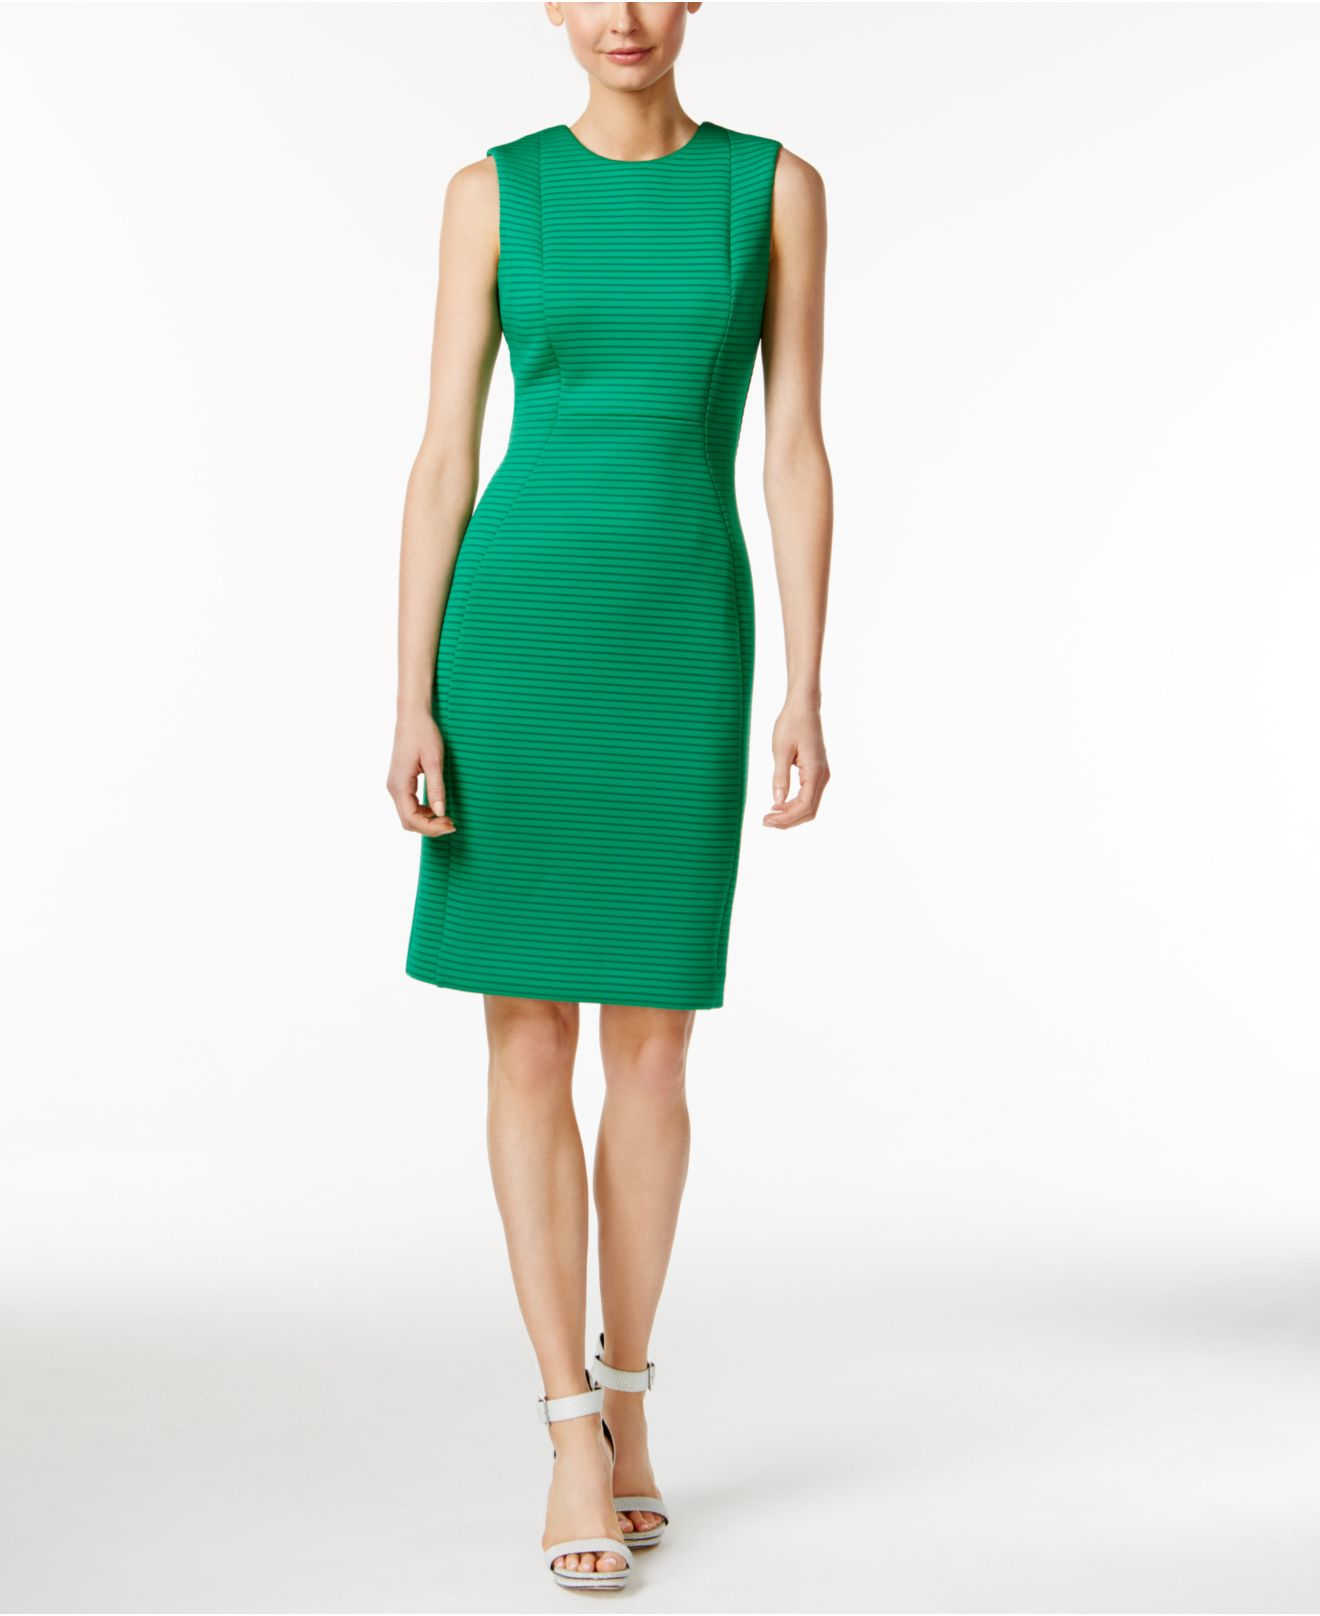 d8adb83c Calvin Klein Sleeveless Striped Sheath Dress in Green - Lyst